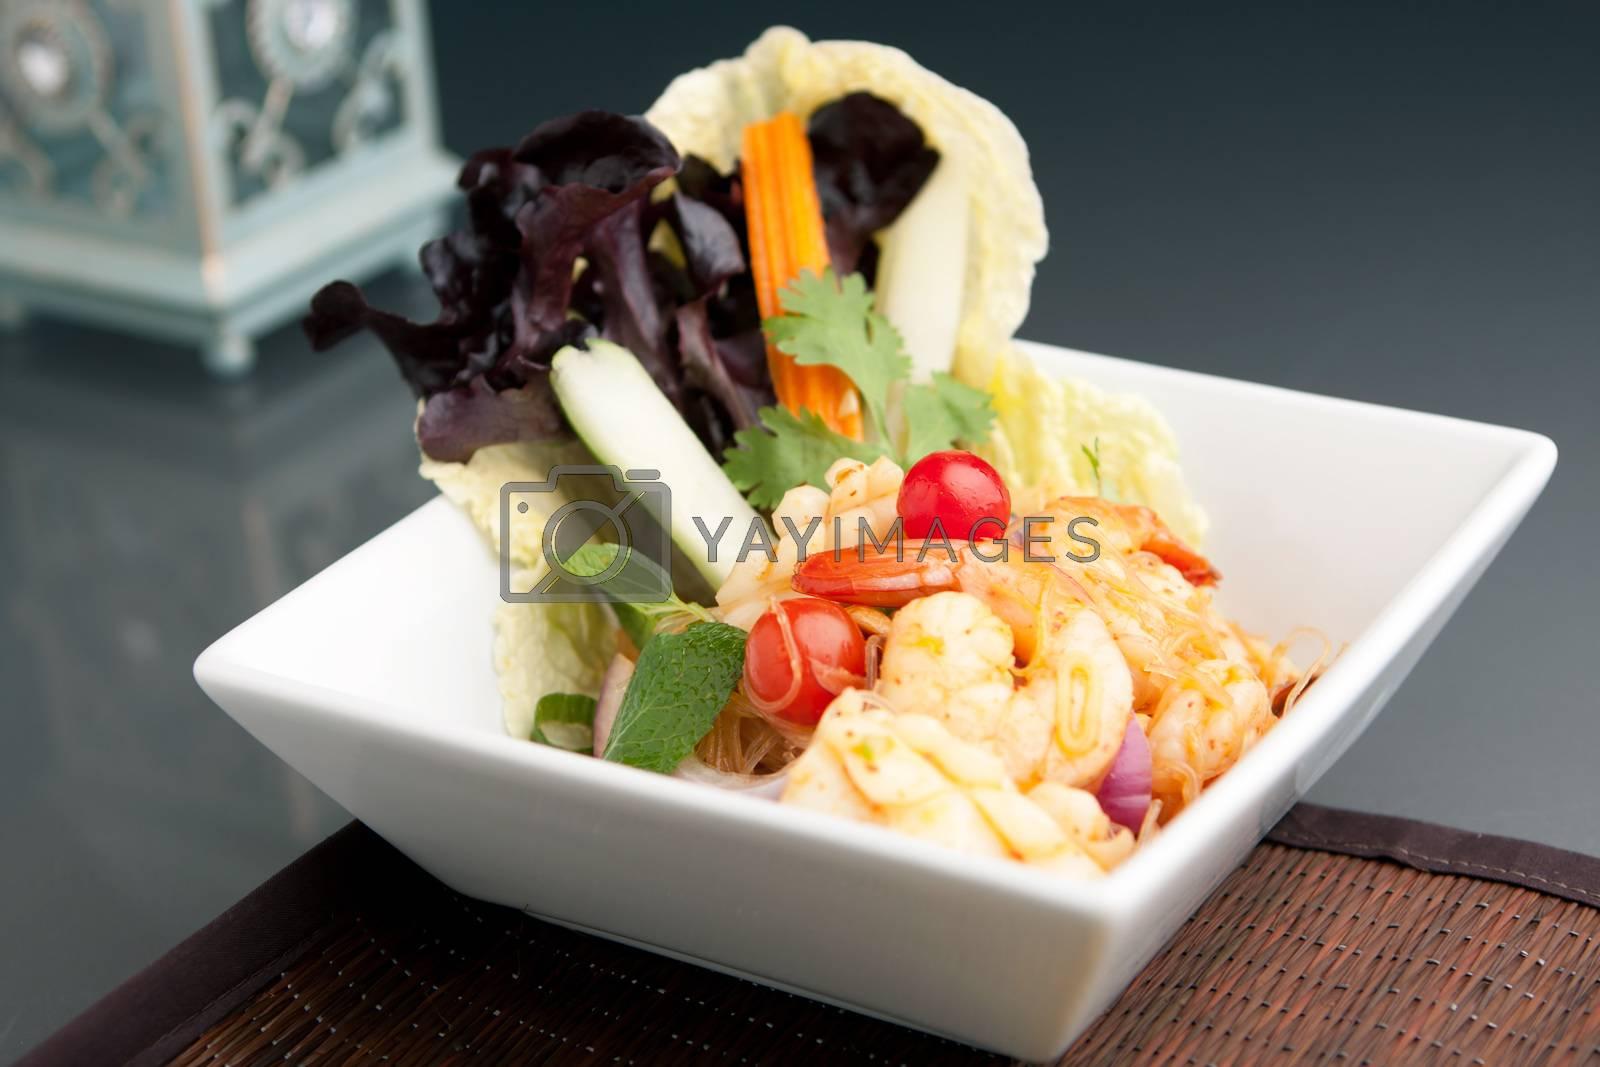 Thailand style shrimp and squid salad with veggies.